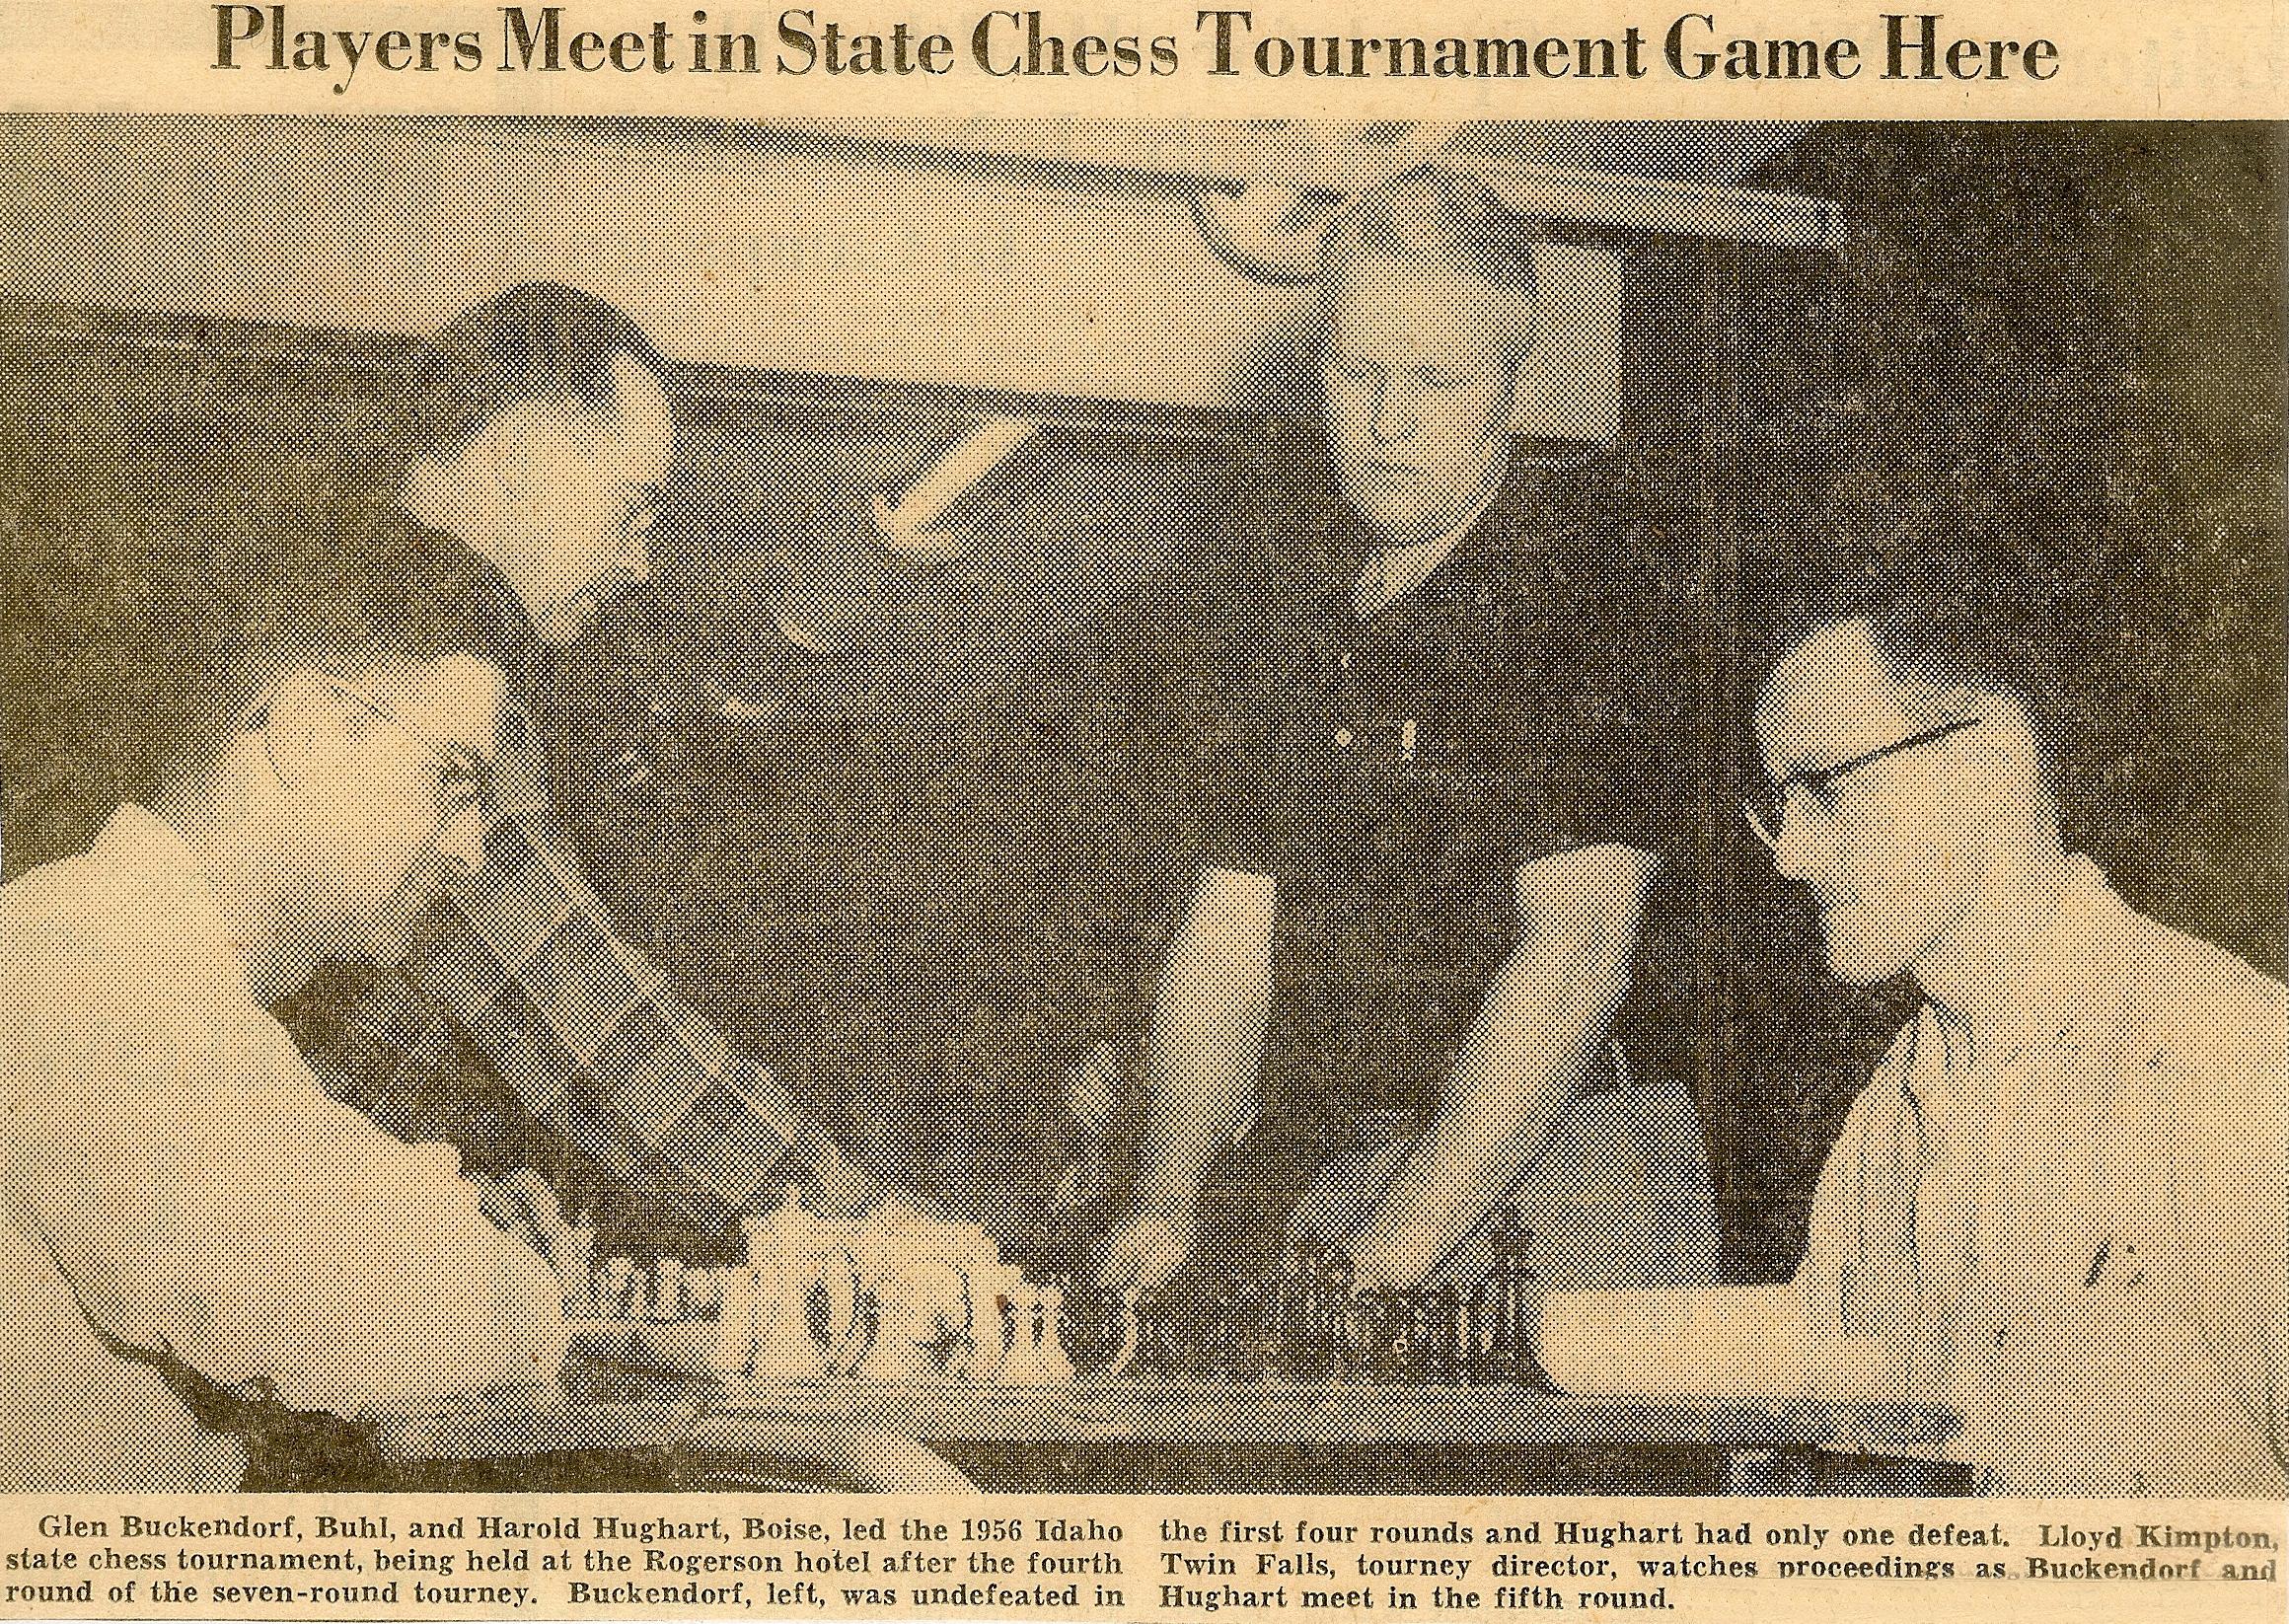 1956 Idaho State Championship0001